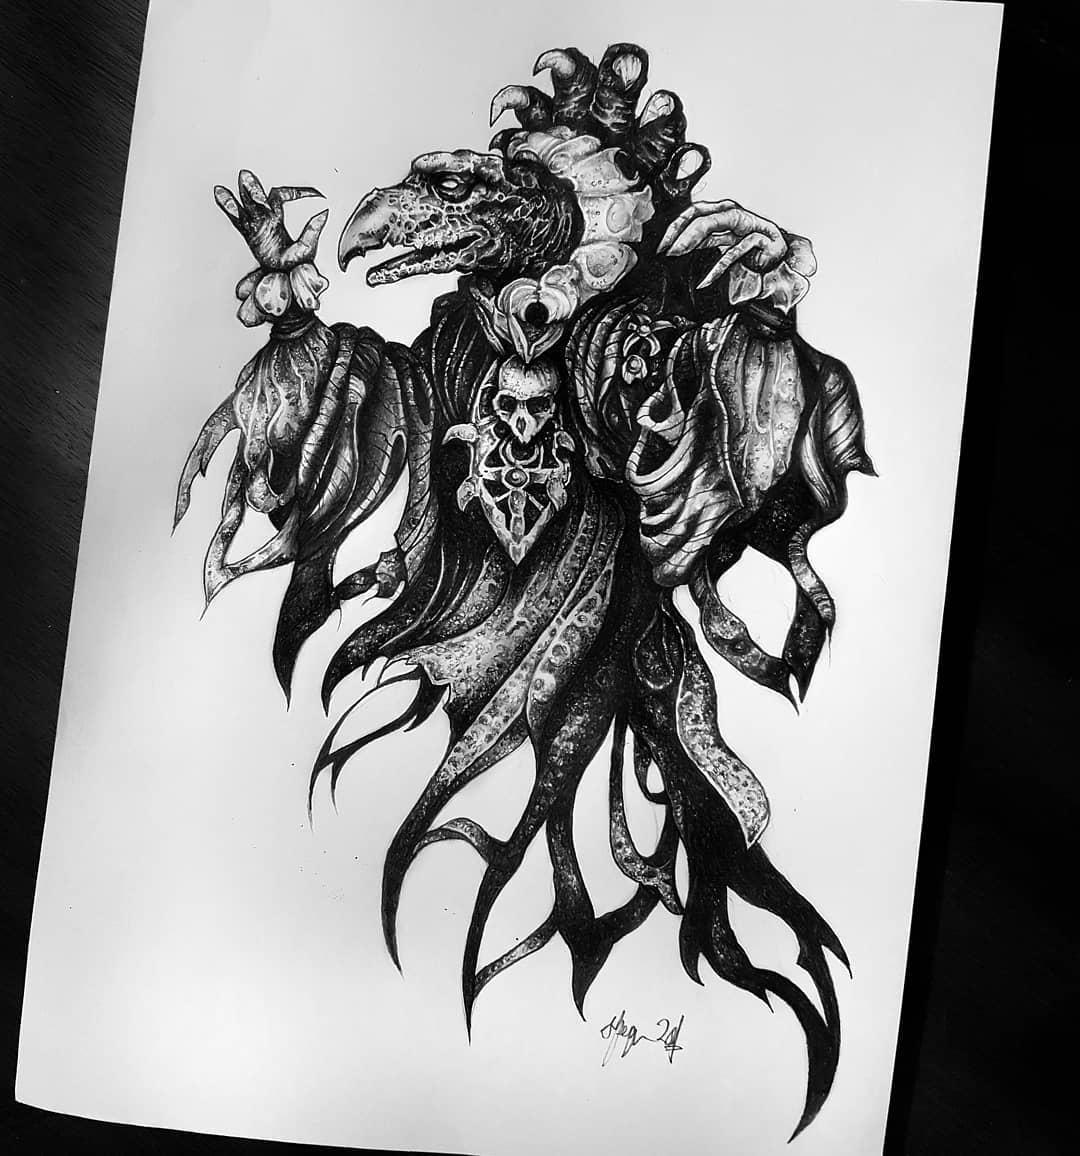 The Chamberlain (from the forever favourite The Dark Crystal 🖤) Available design, get in touch at goatskullshirley@gmail.com for booking details 🦇🦇🦇 . . . . . . occultarcana artesobscurae btattooing flashworkers blackwork blackworkers blxckink darkartists darkart darkarts thedarkestwork onlyblackart onlythedarkest  blacktattoo metalhead blackmetal occult wiccac witchythings darkartistries edinburgh goth gothic studioxiii @artesobscurae @occultarcana @thedarkestwork @onlythedarkest @black_tattoo_culture @darkartists @wiccac